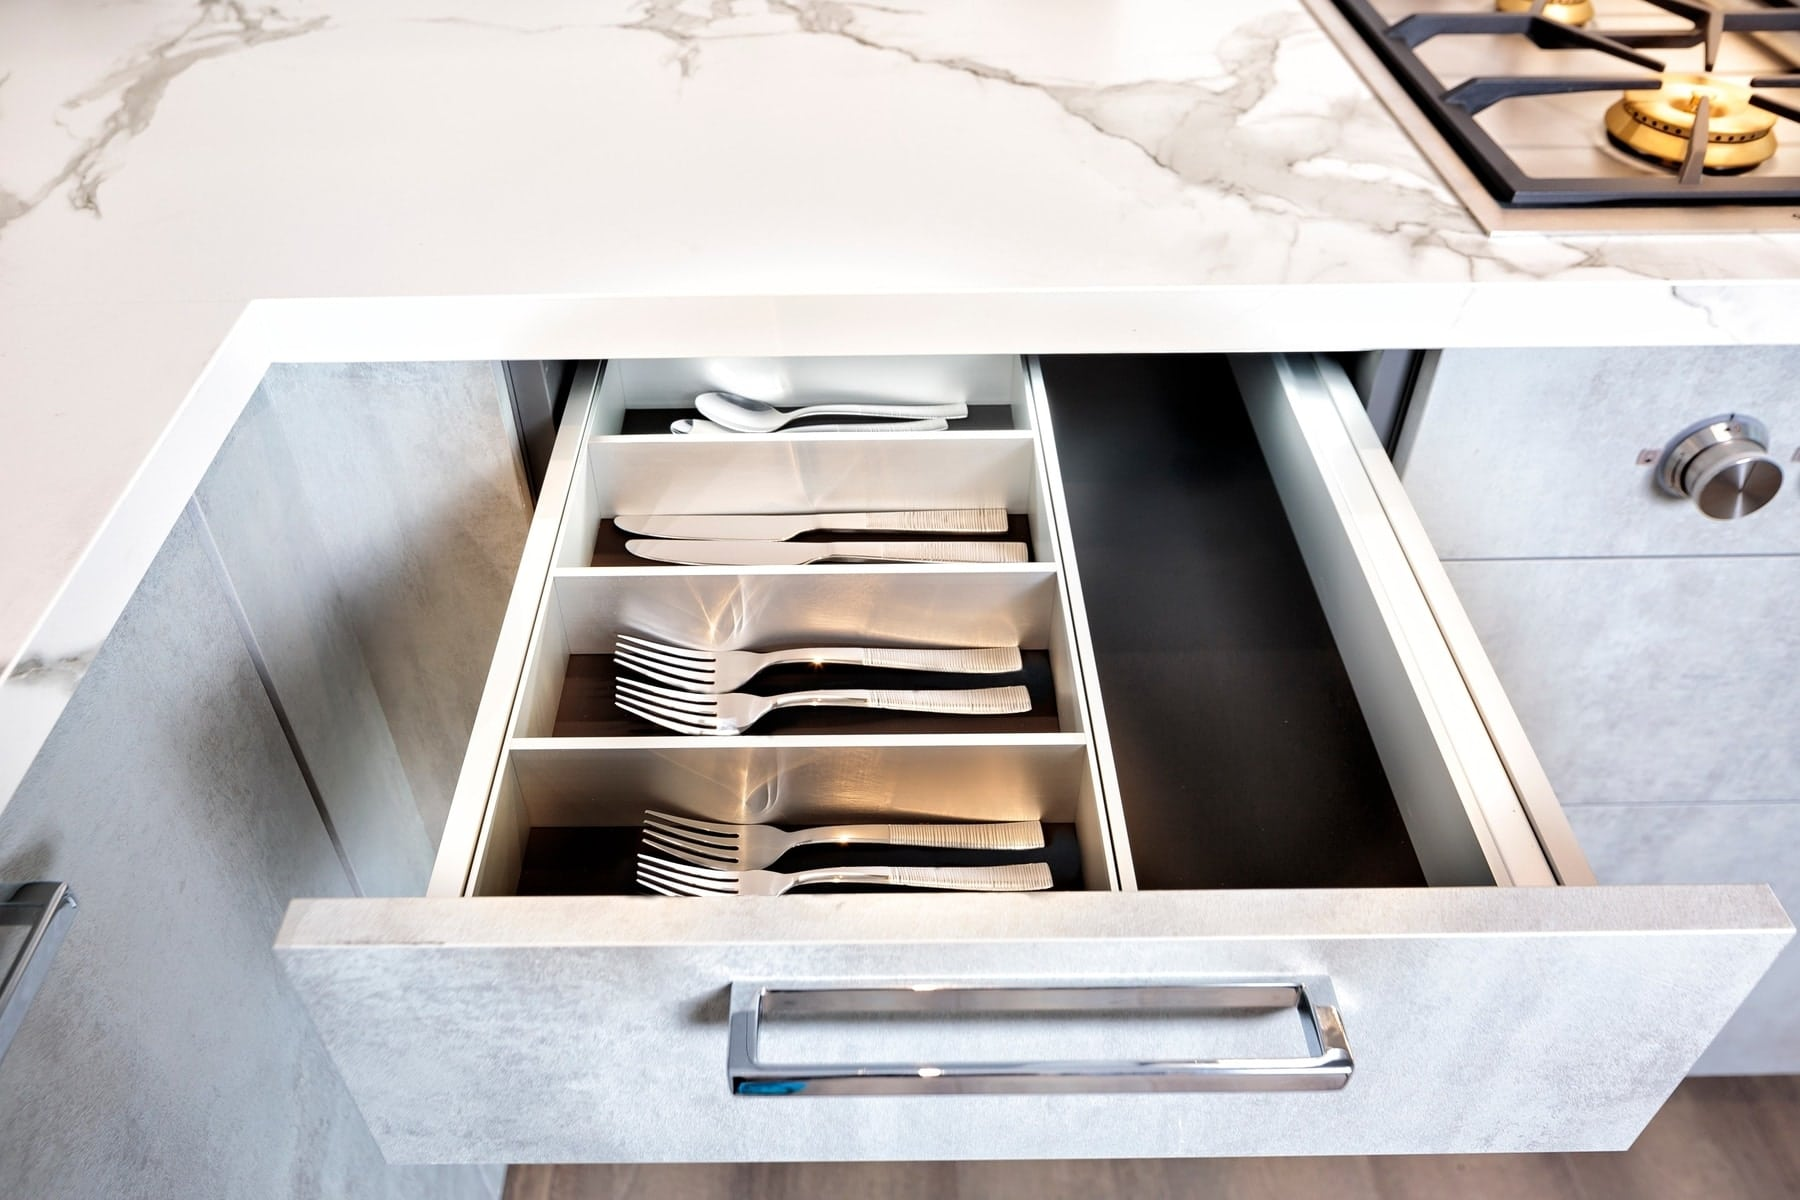 eggersmann boxtec flatware drawer organizer in the kitchen of the model unit of arabella luxury condos in houston